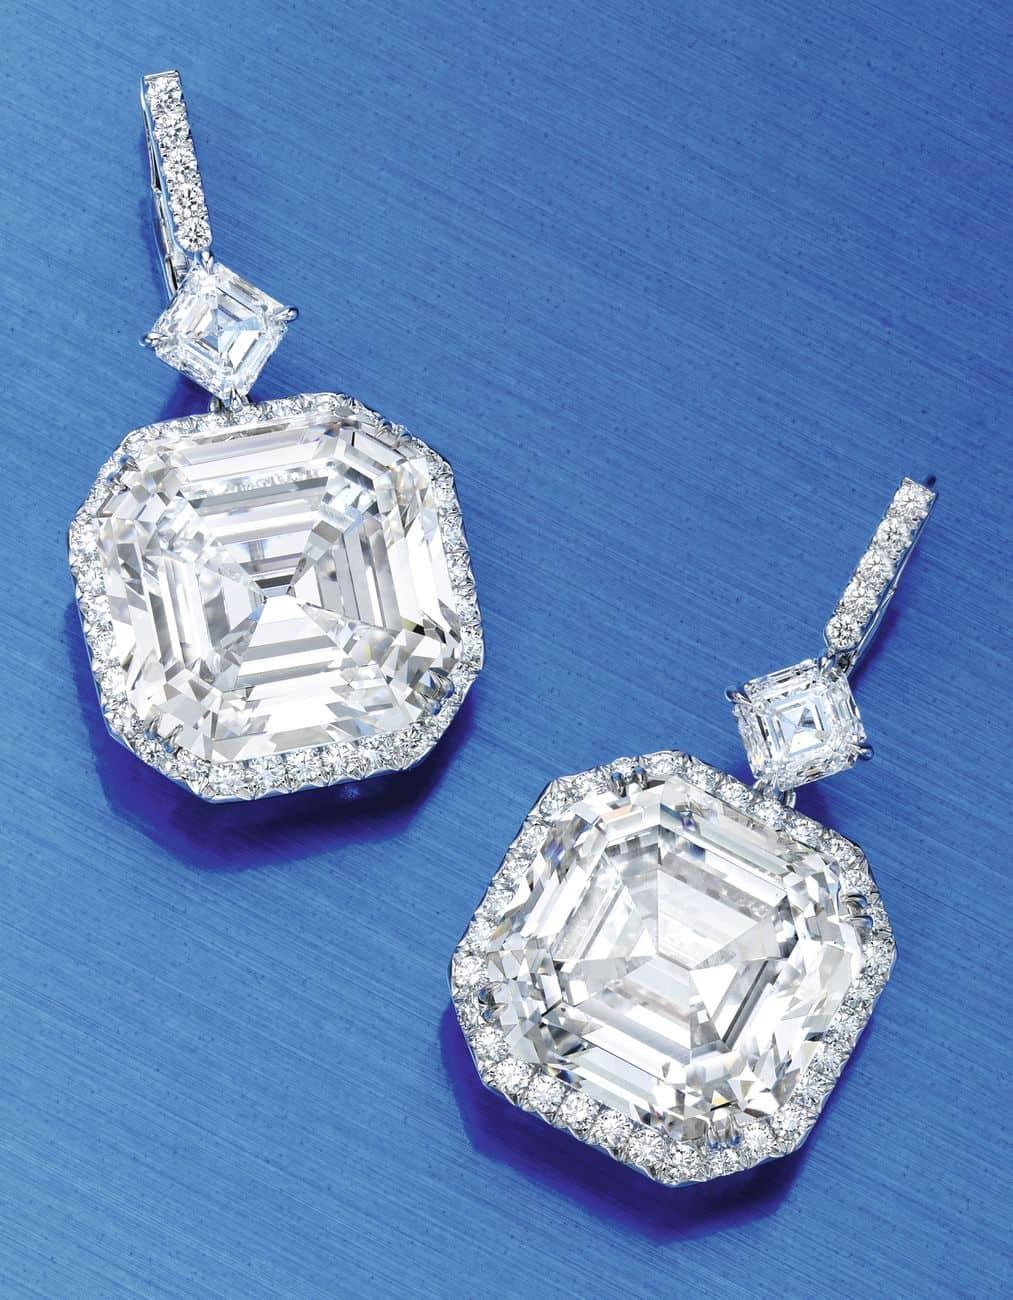 Lot 82 - Extraordinary Pair of Platinum and Diamond Earrings